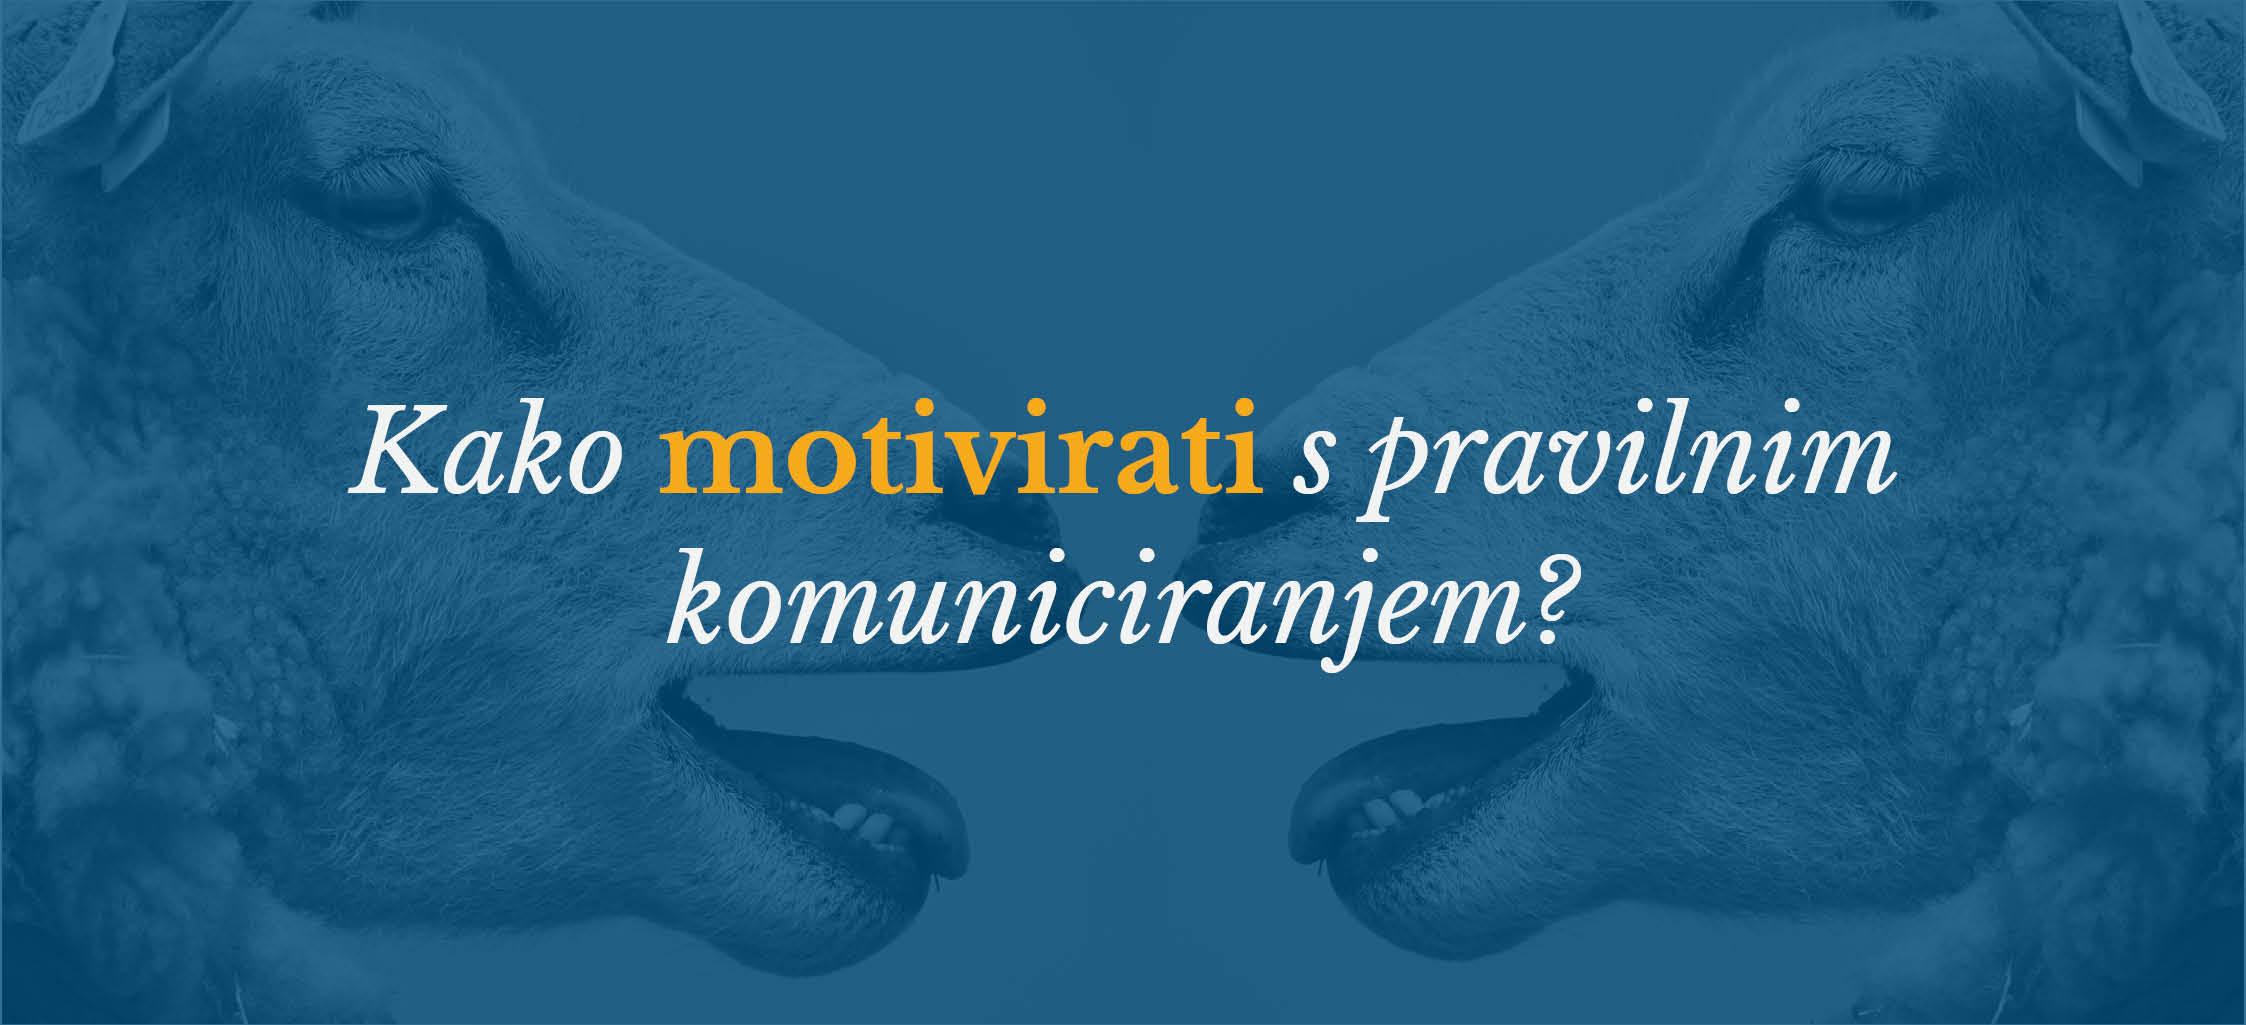 Kako motivirati s pravilnim komuniciranjem?